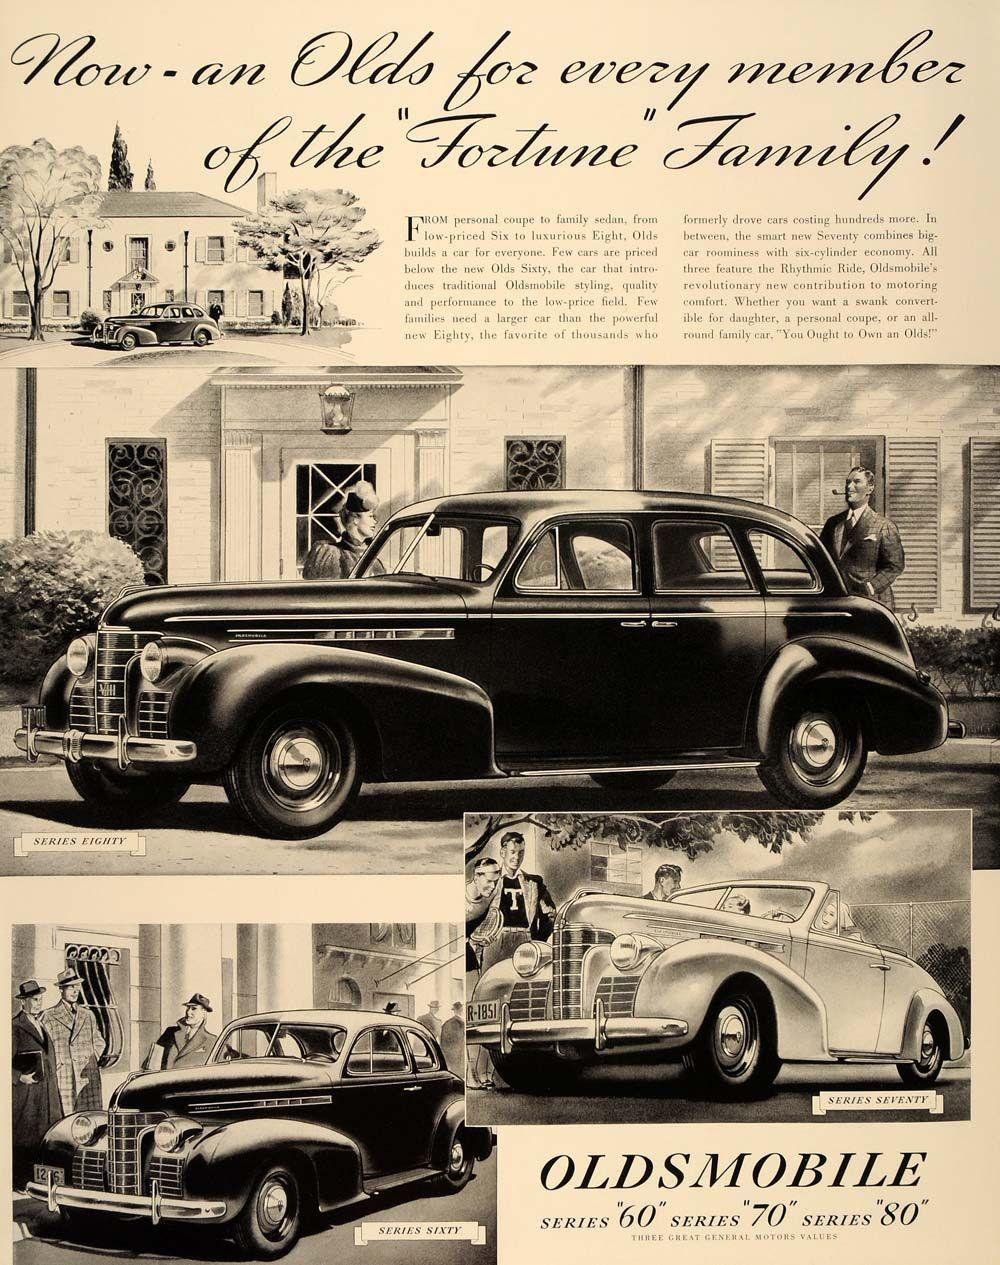 1939 Ad Oldsmobile Automobile Olds Series 60 70 80 Original